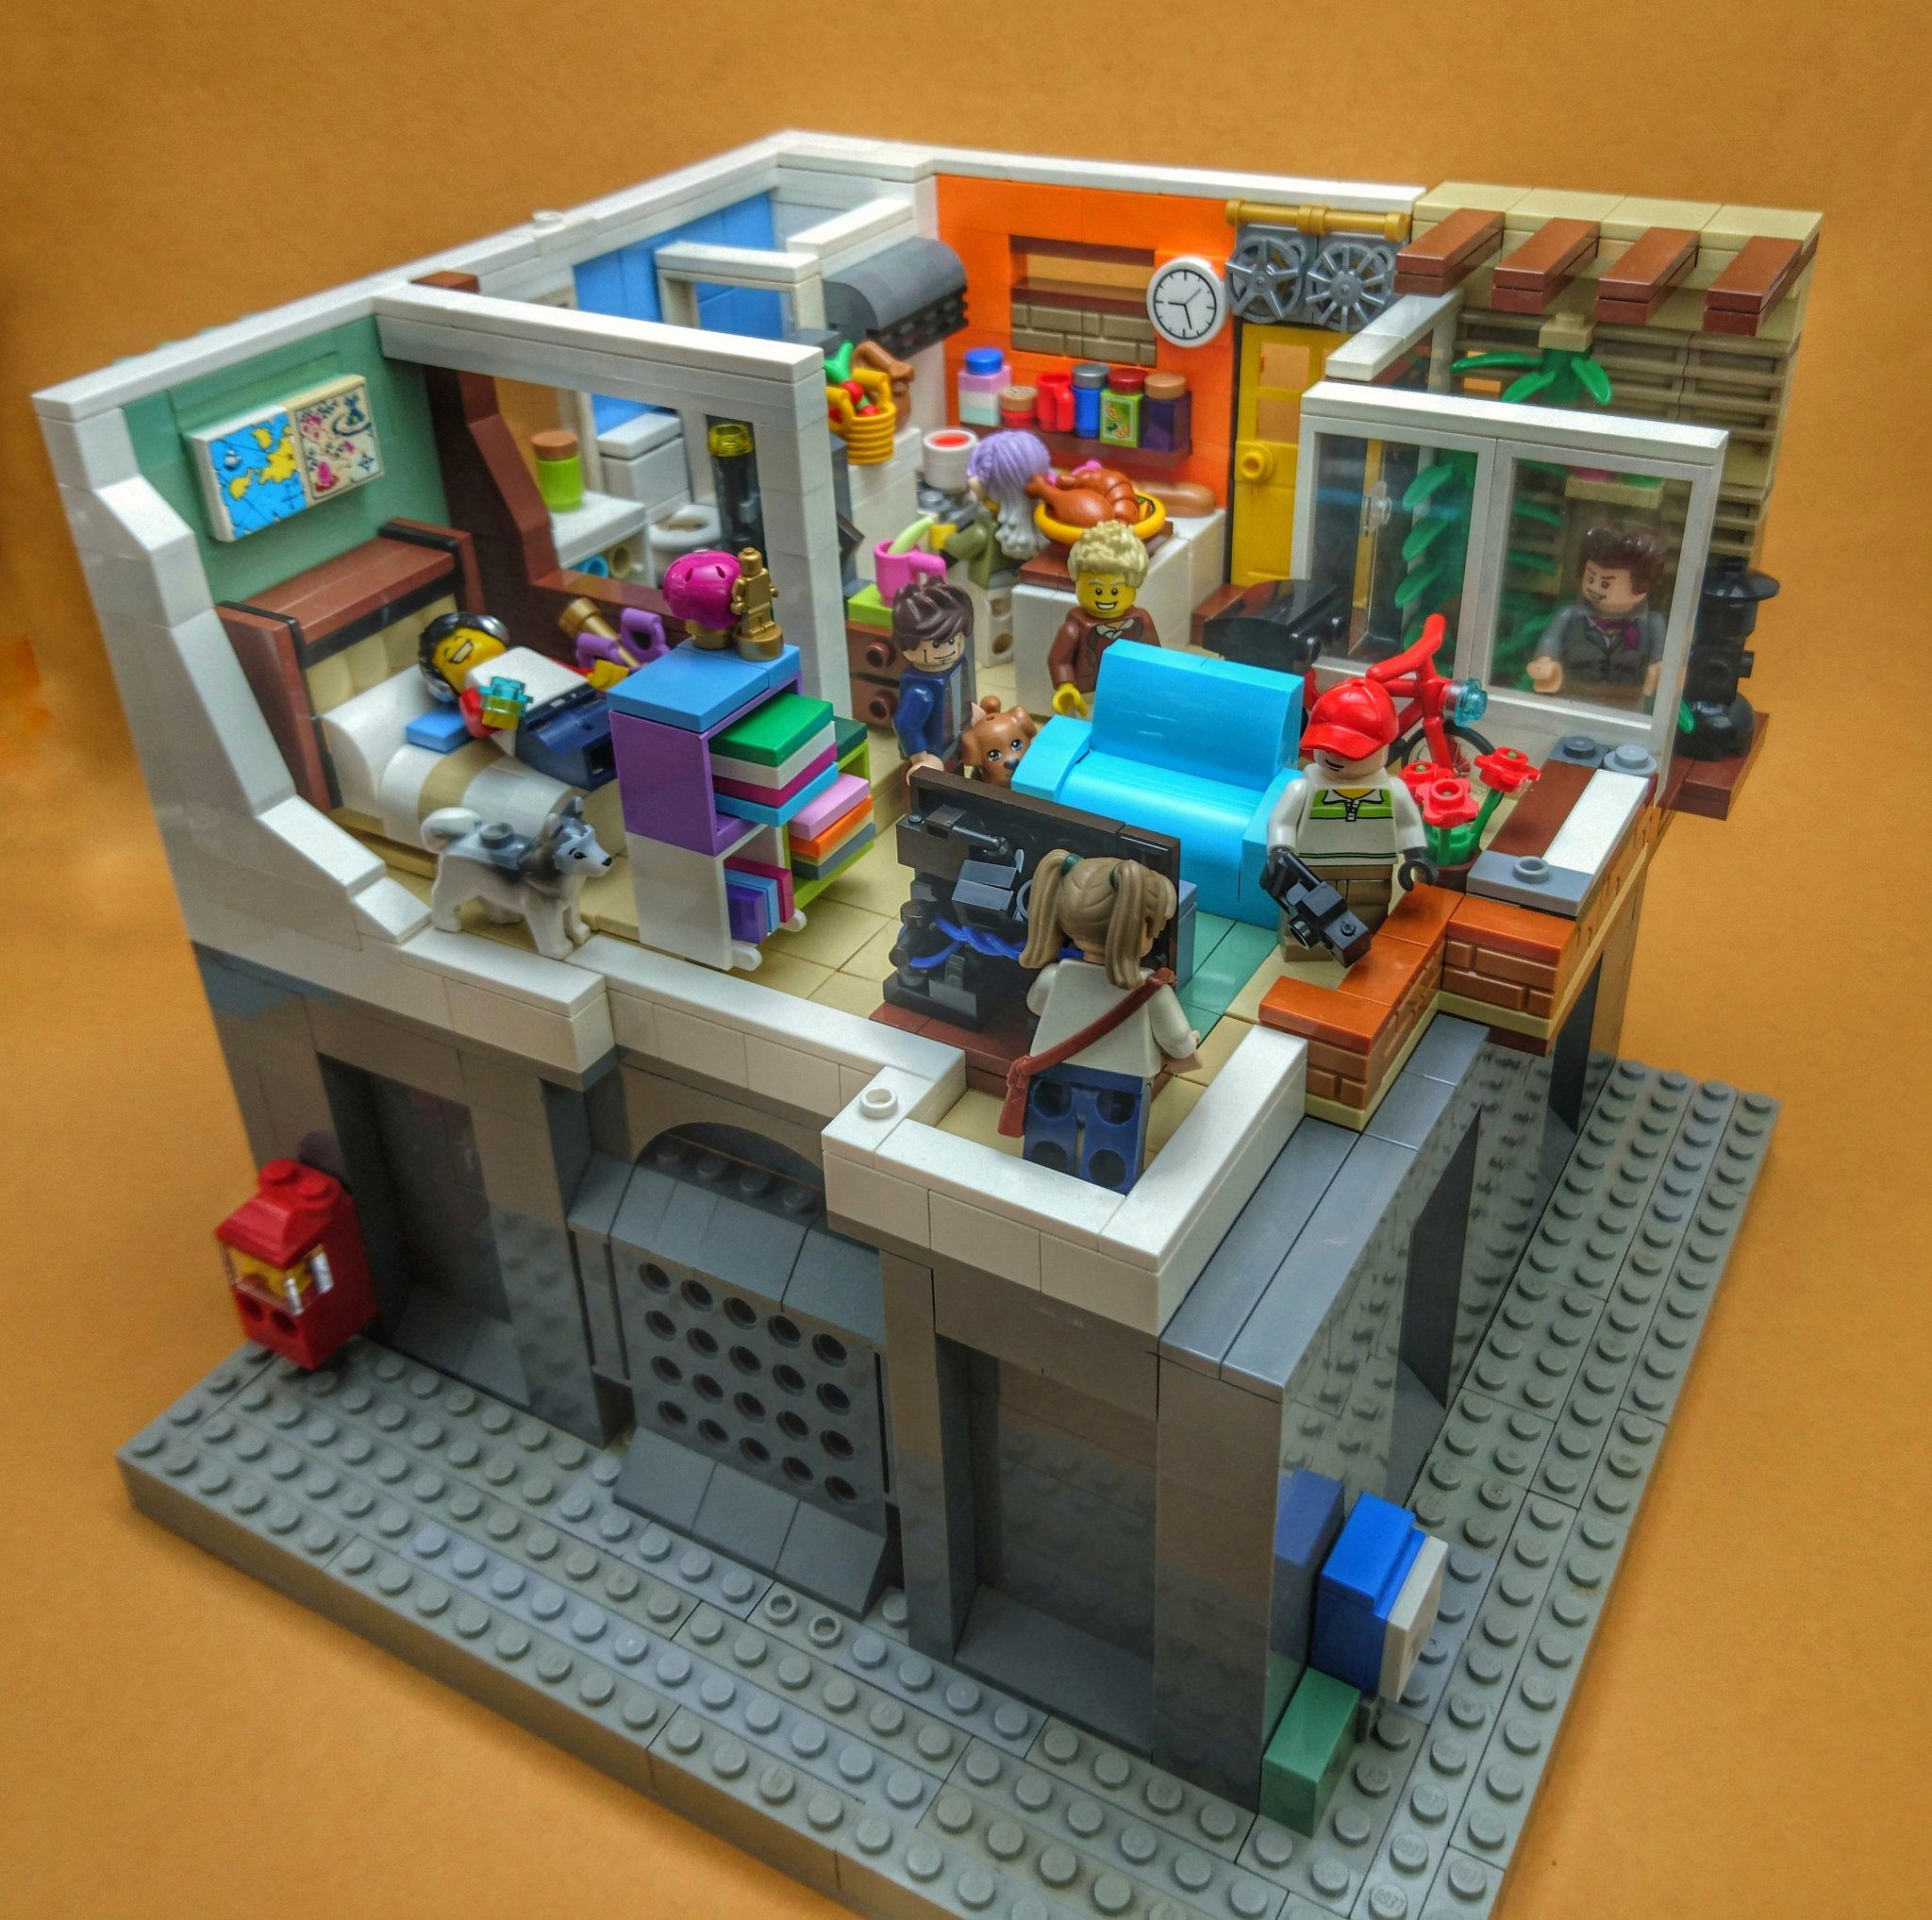 modular interior | lego ideen | pinterest | lego ideen, lego und ideen